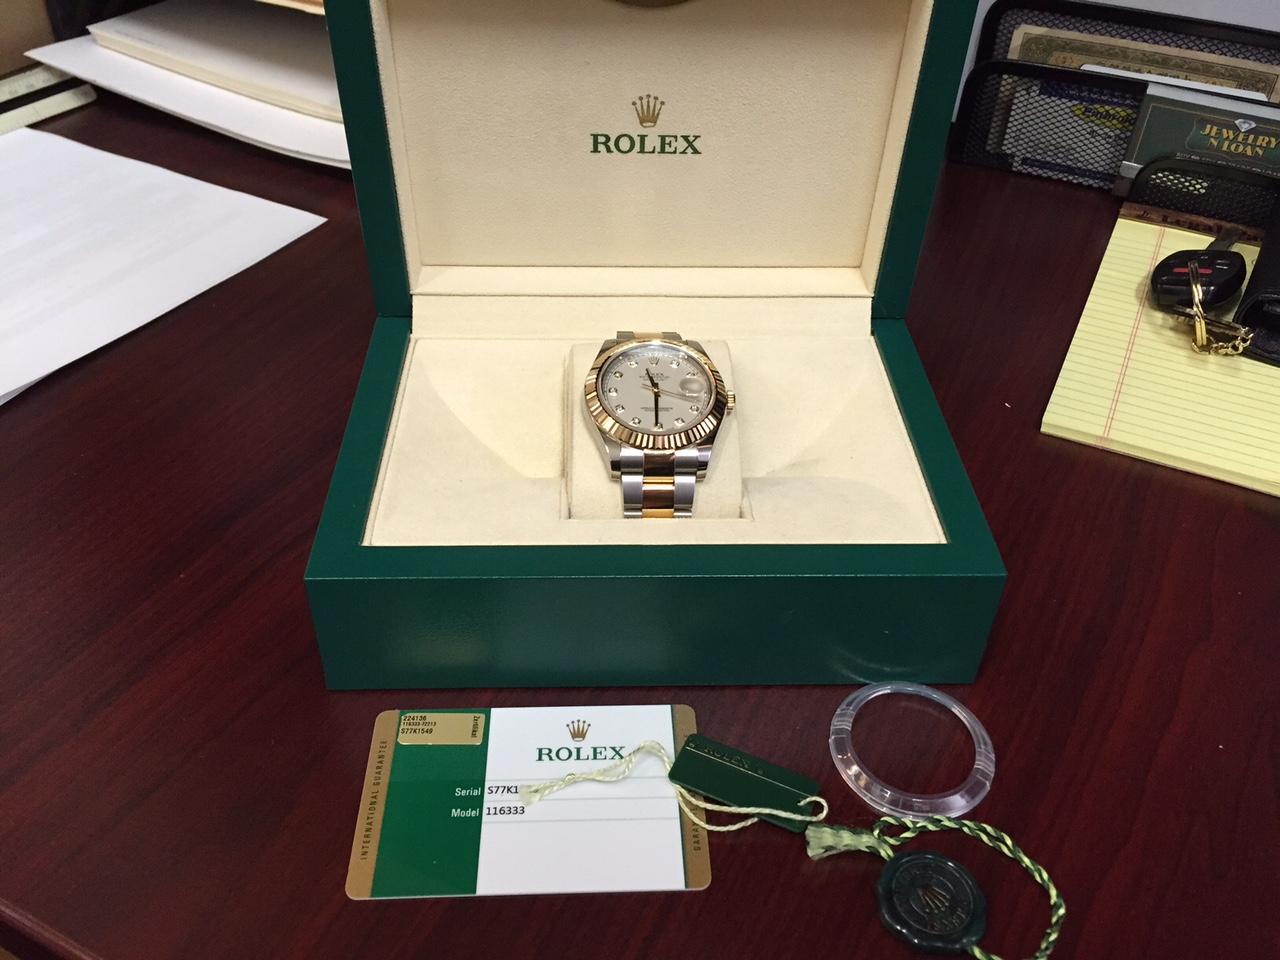 Rolex Two-Tone Datejust II - $10,500